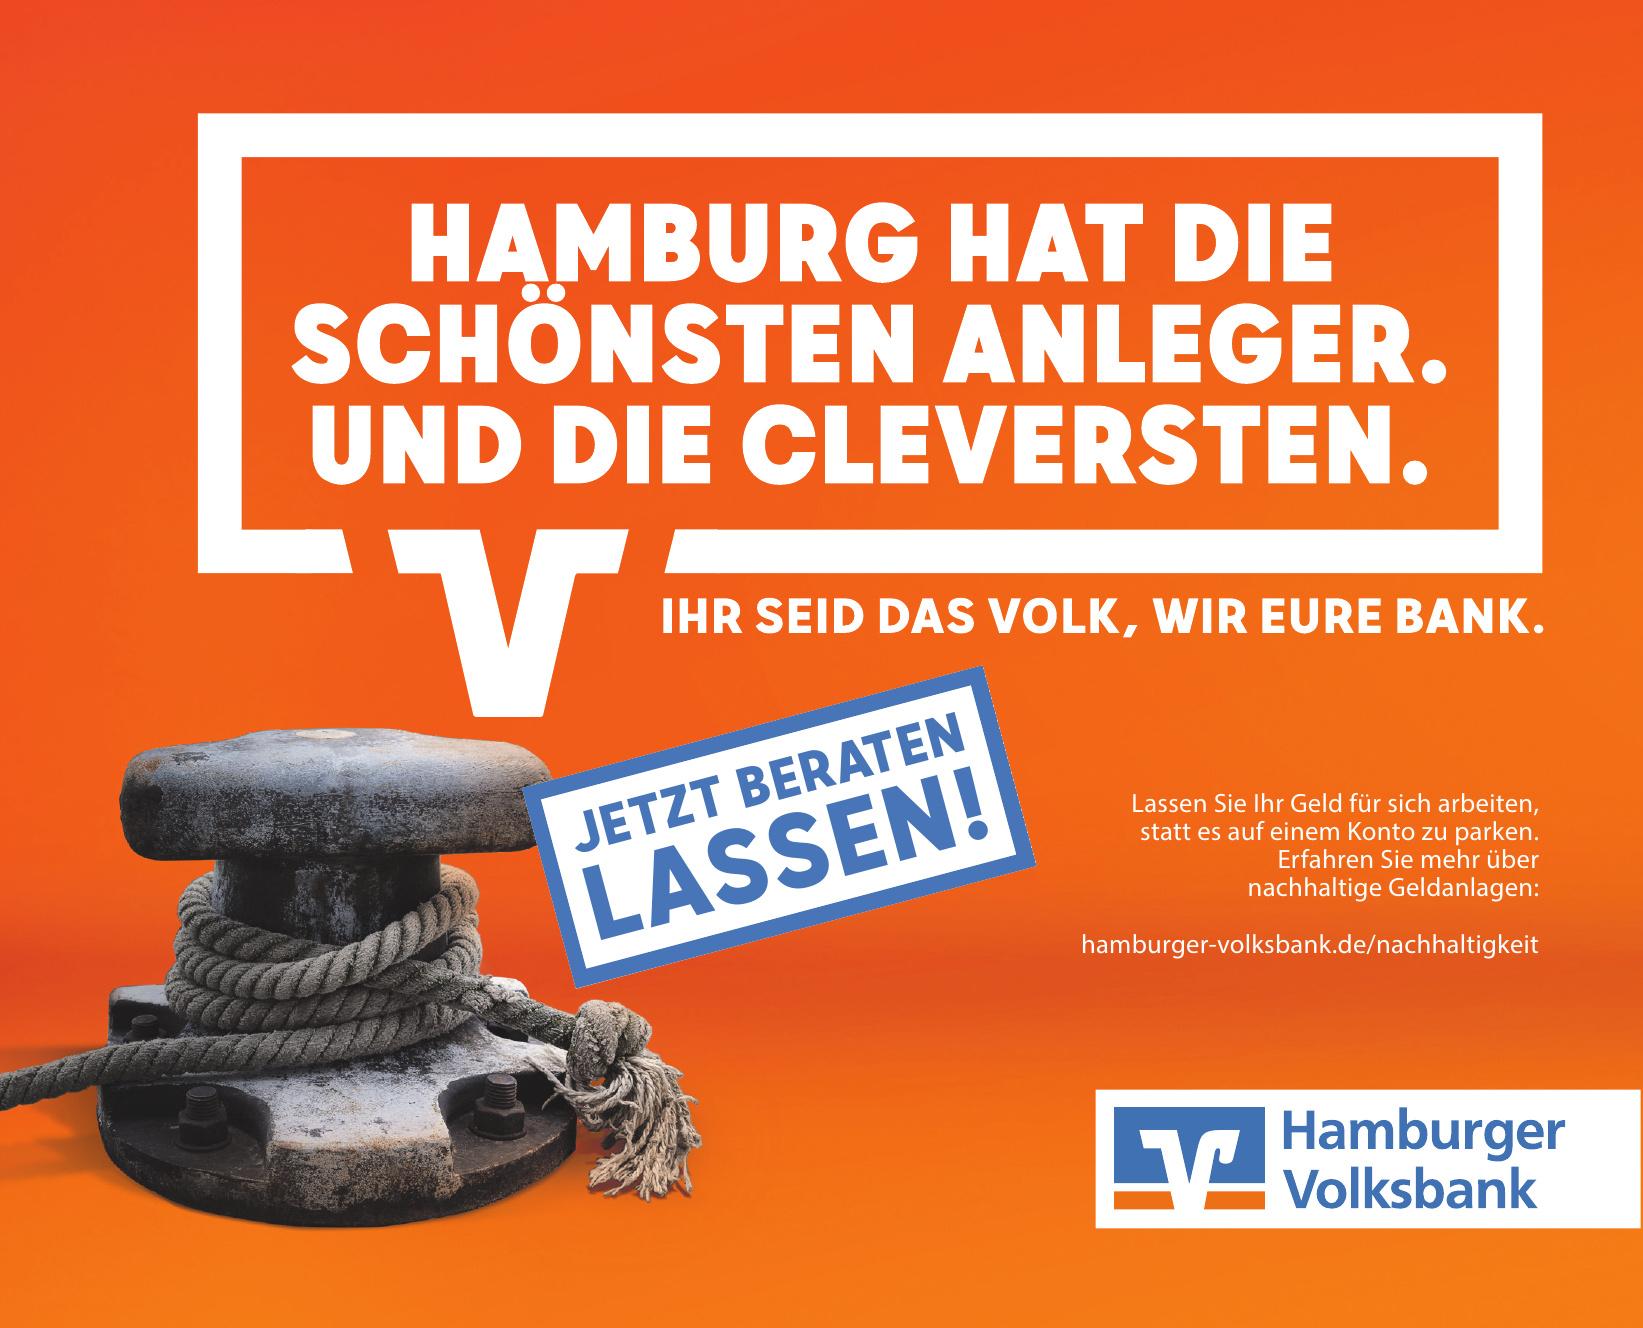 Hamburger Volksbank